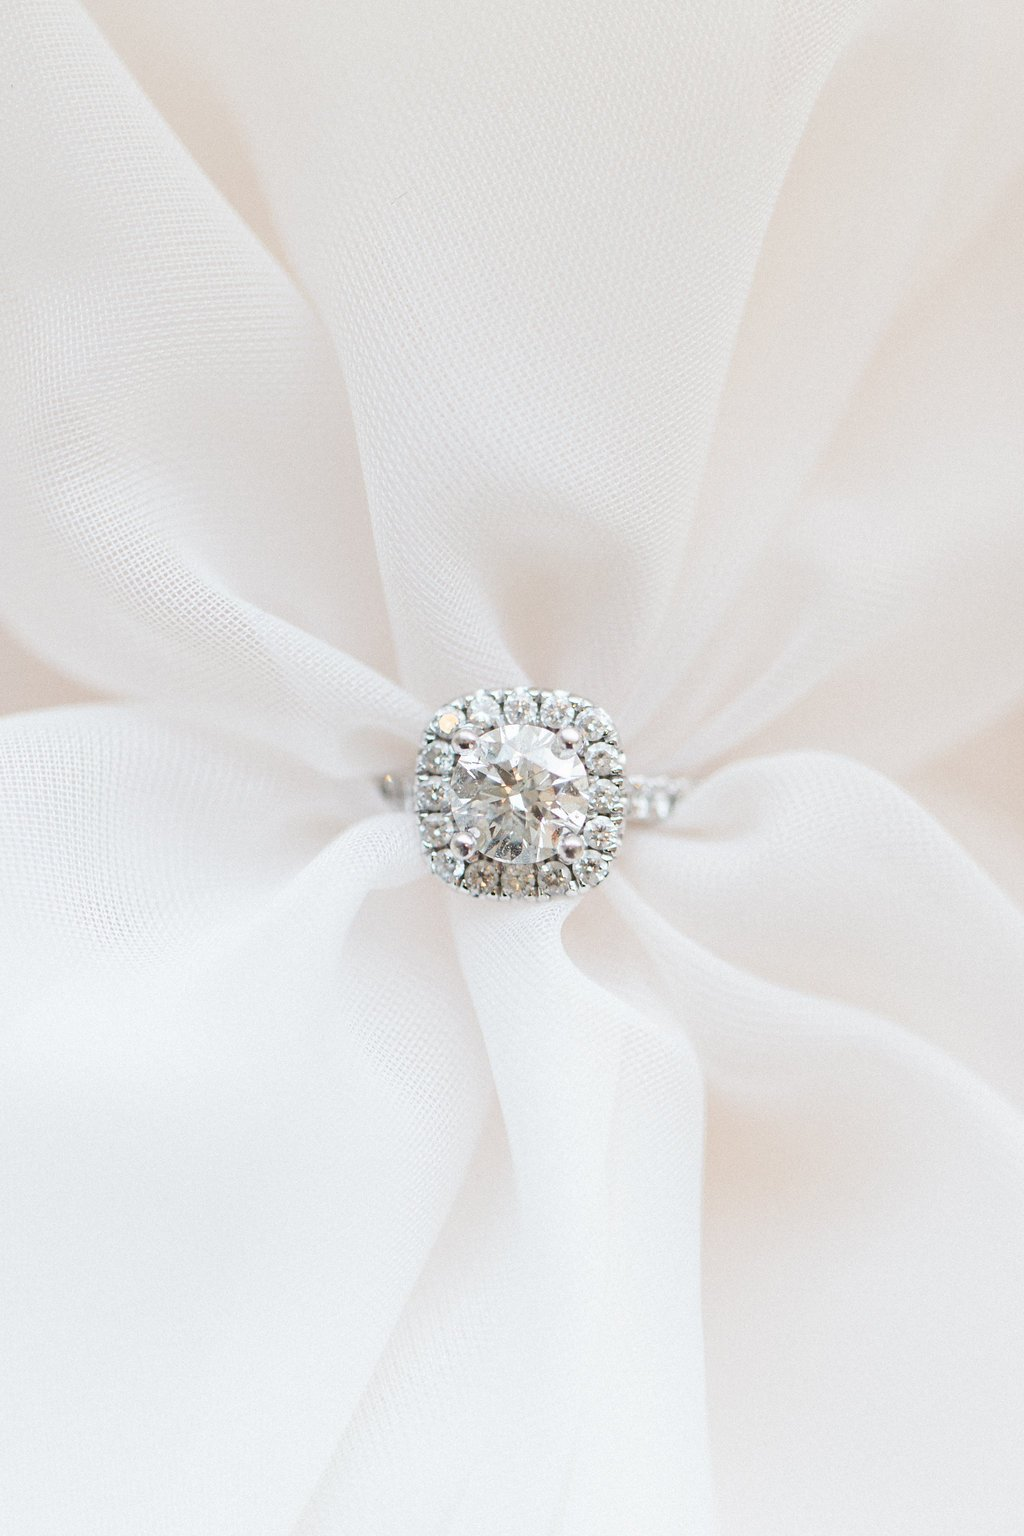 Engagement ring diamond halo